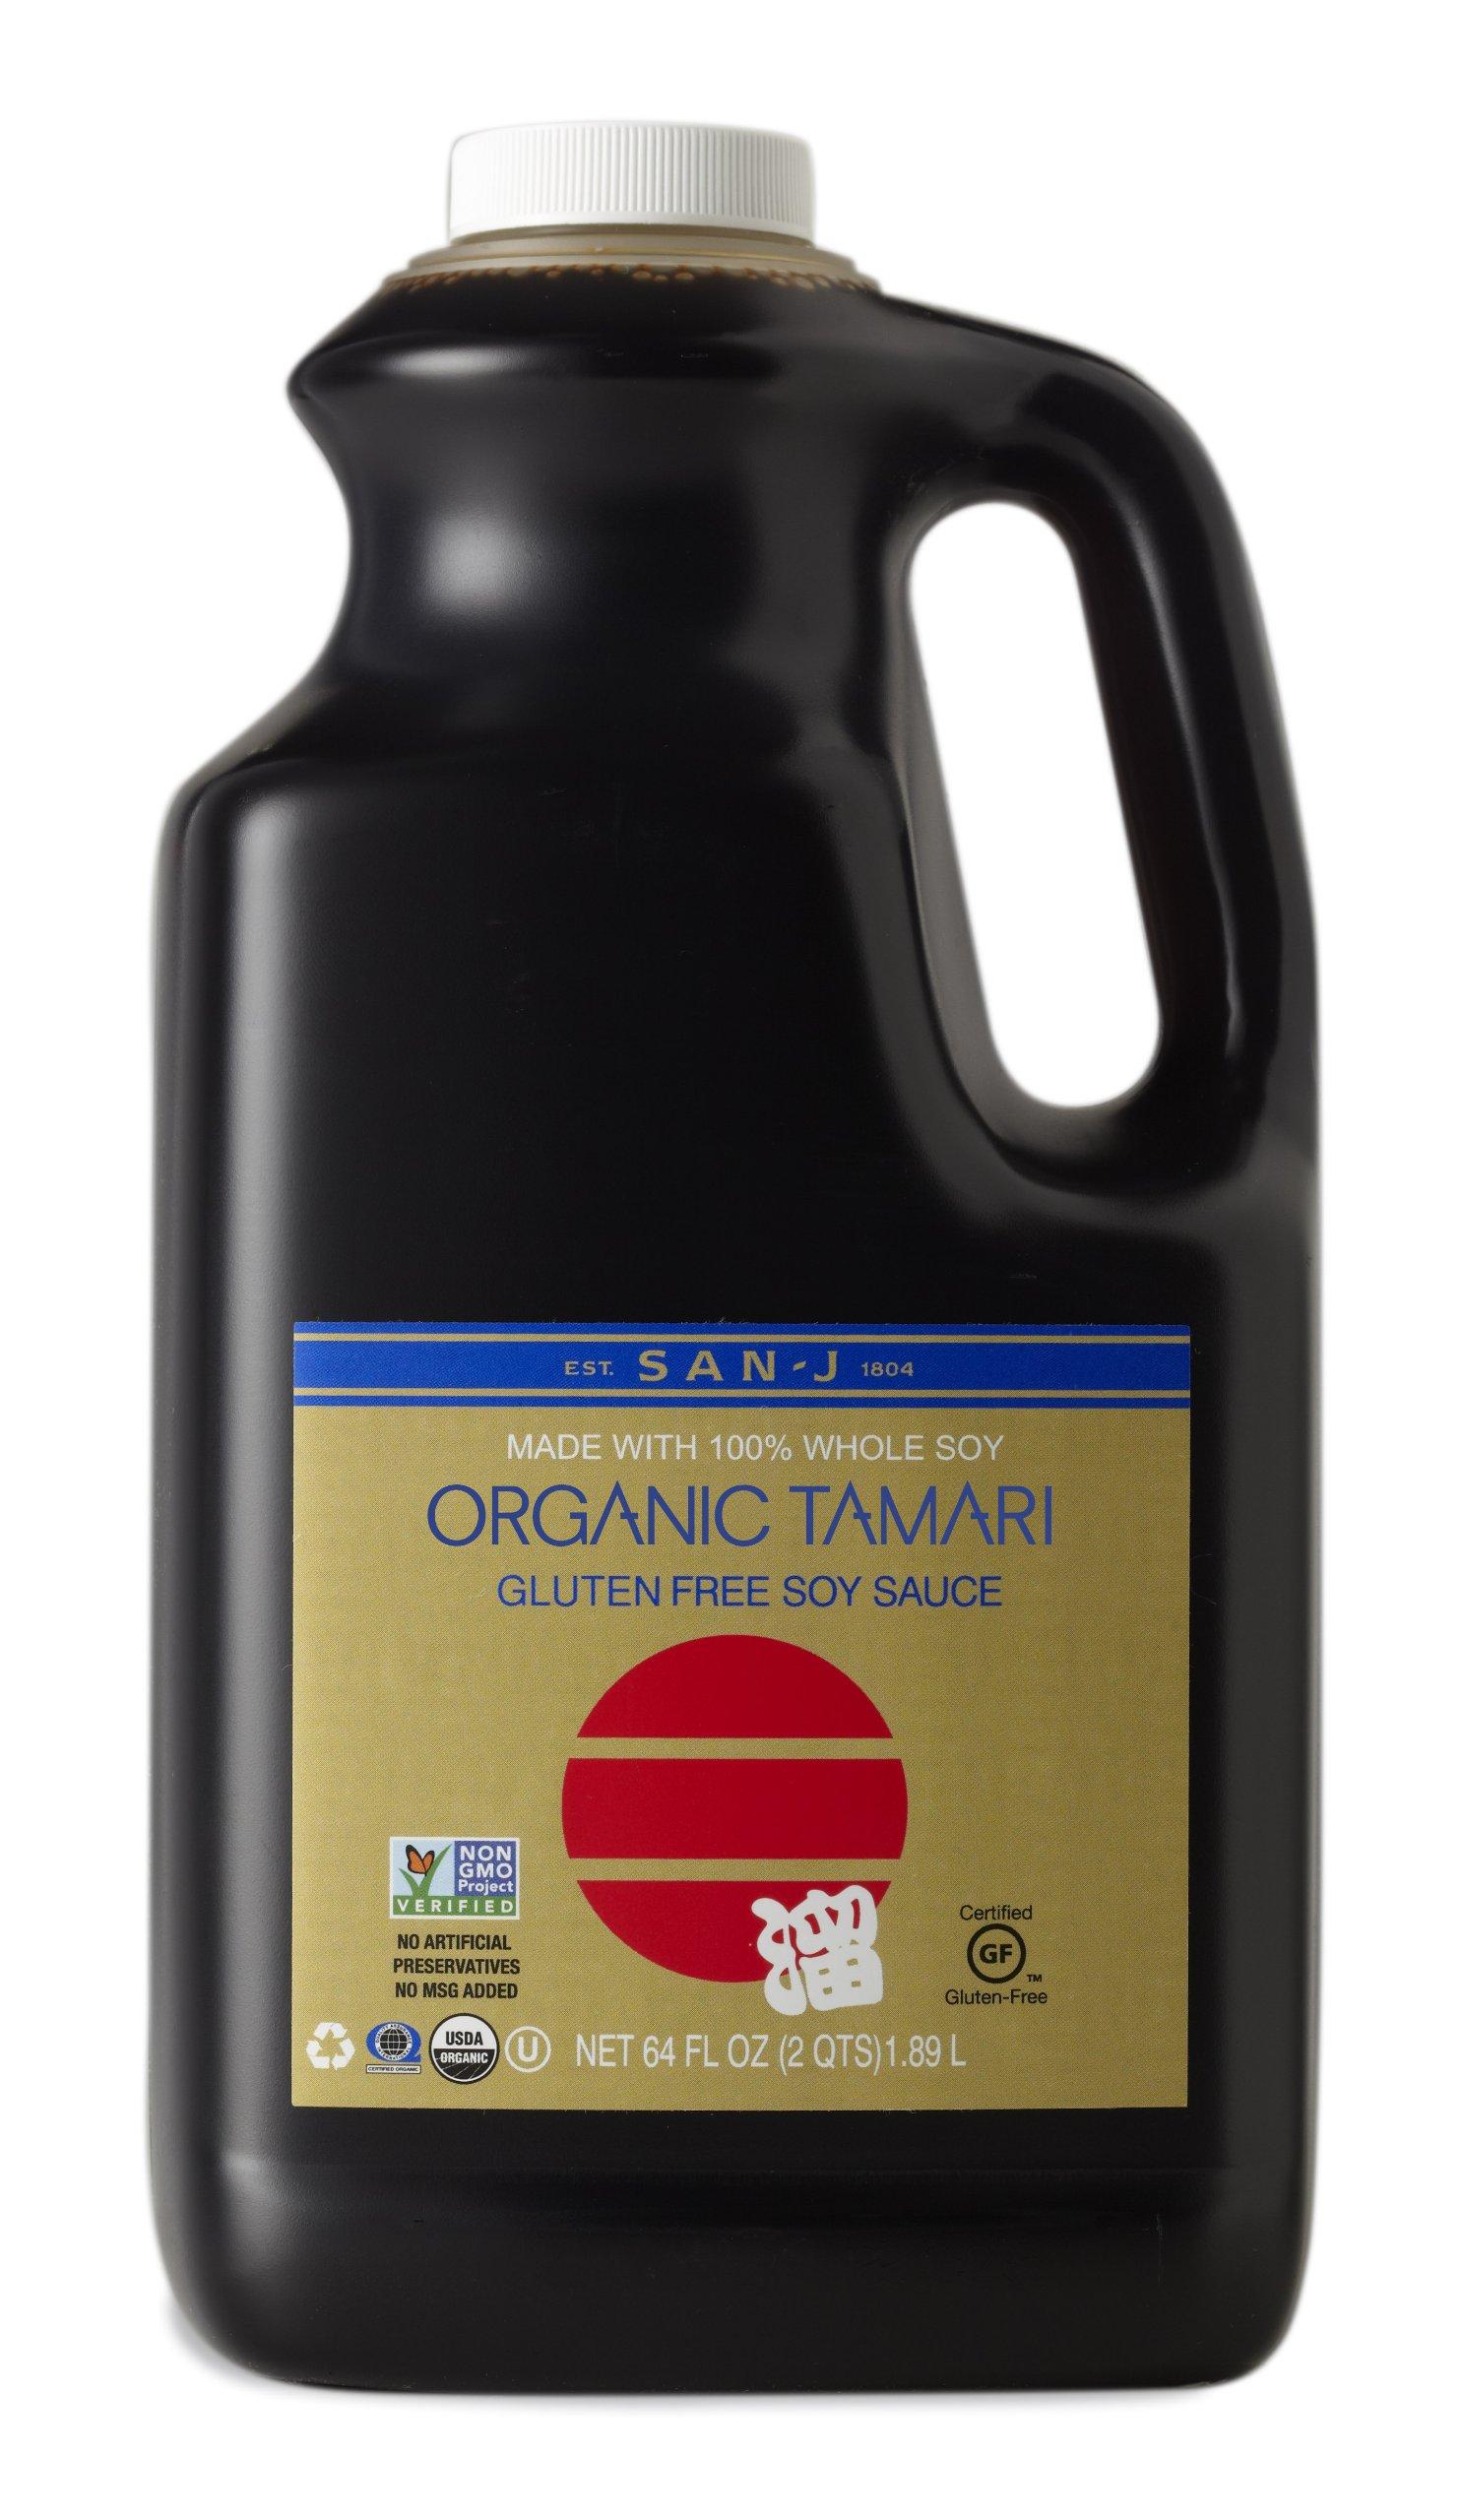 San-J Organic Tamari Gluten Free Soy Sauce Non-GMO,  Gold Label, 64 Ounce by San-J